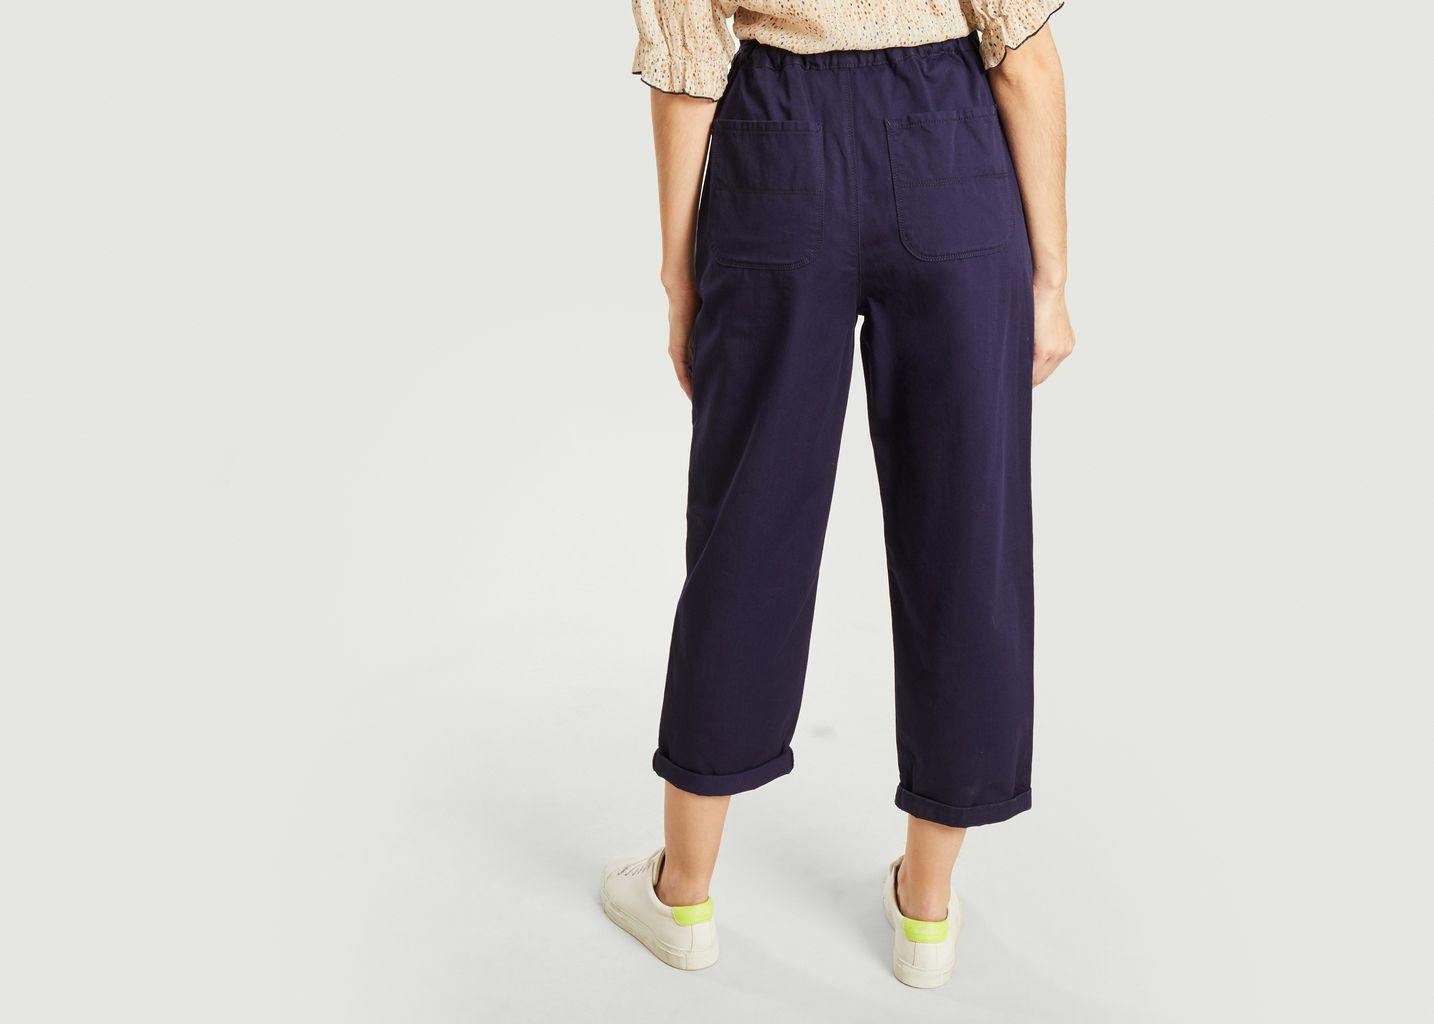 Pantalon Worker - Bellerose